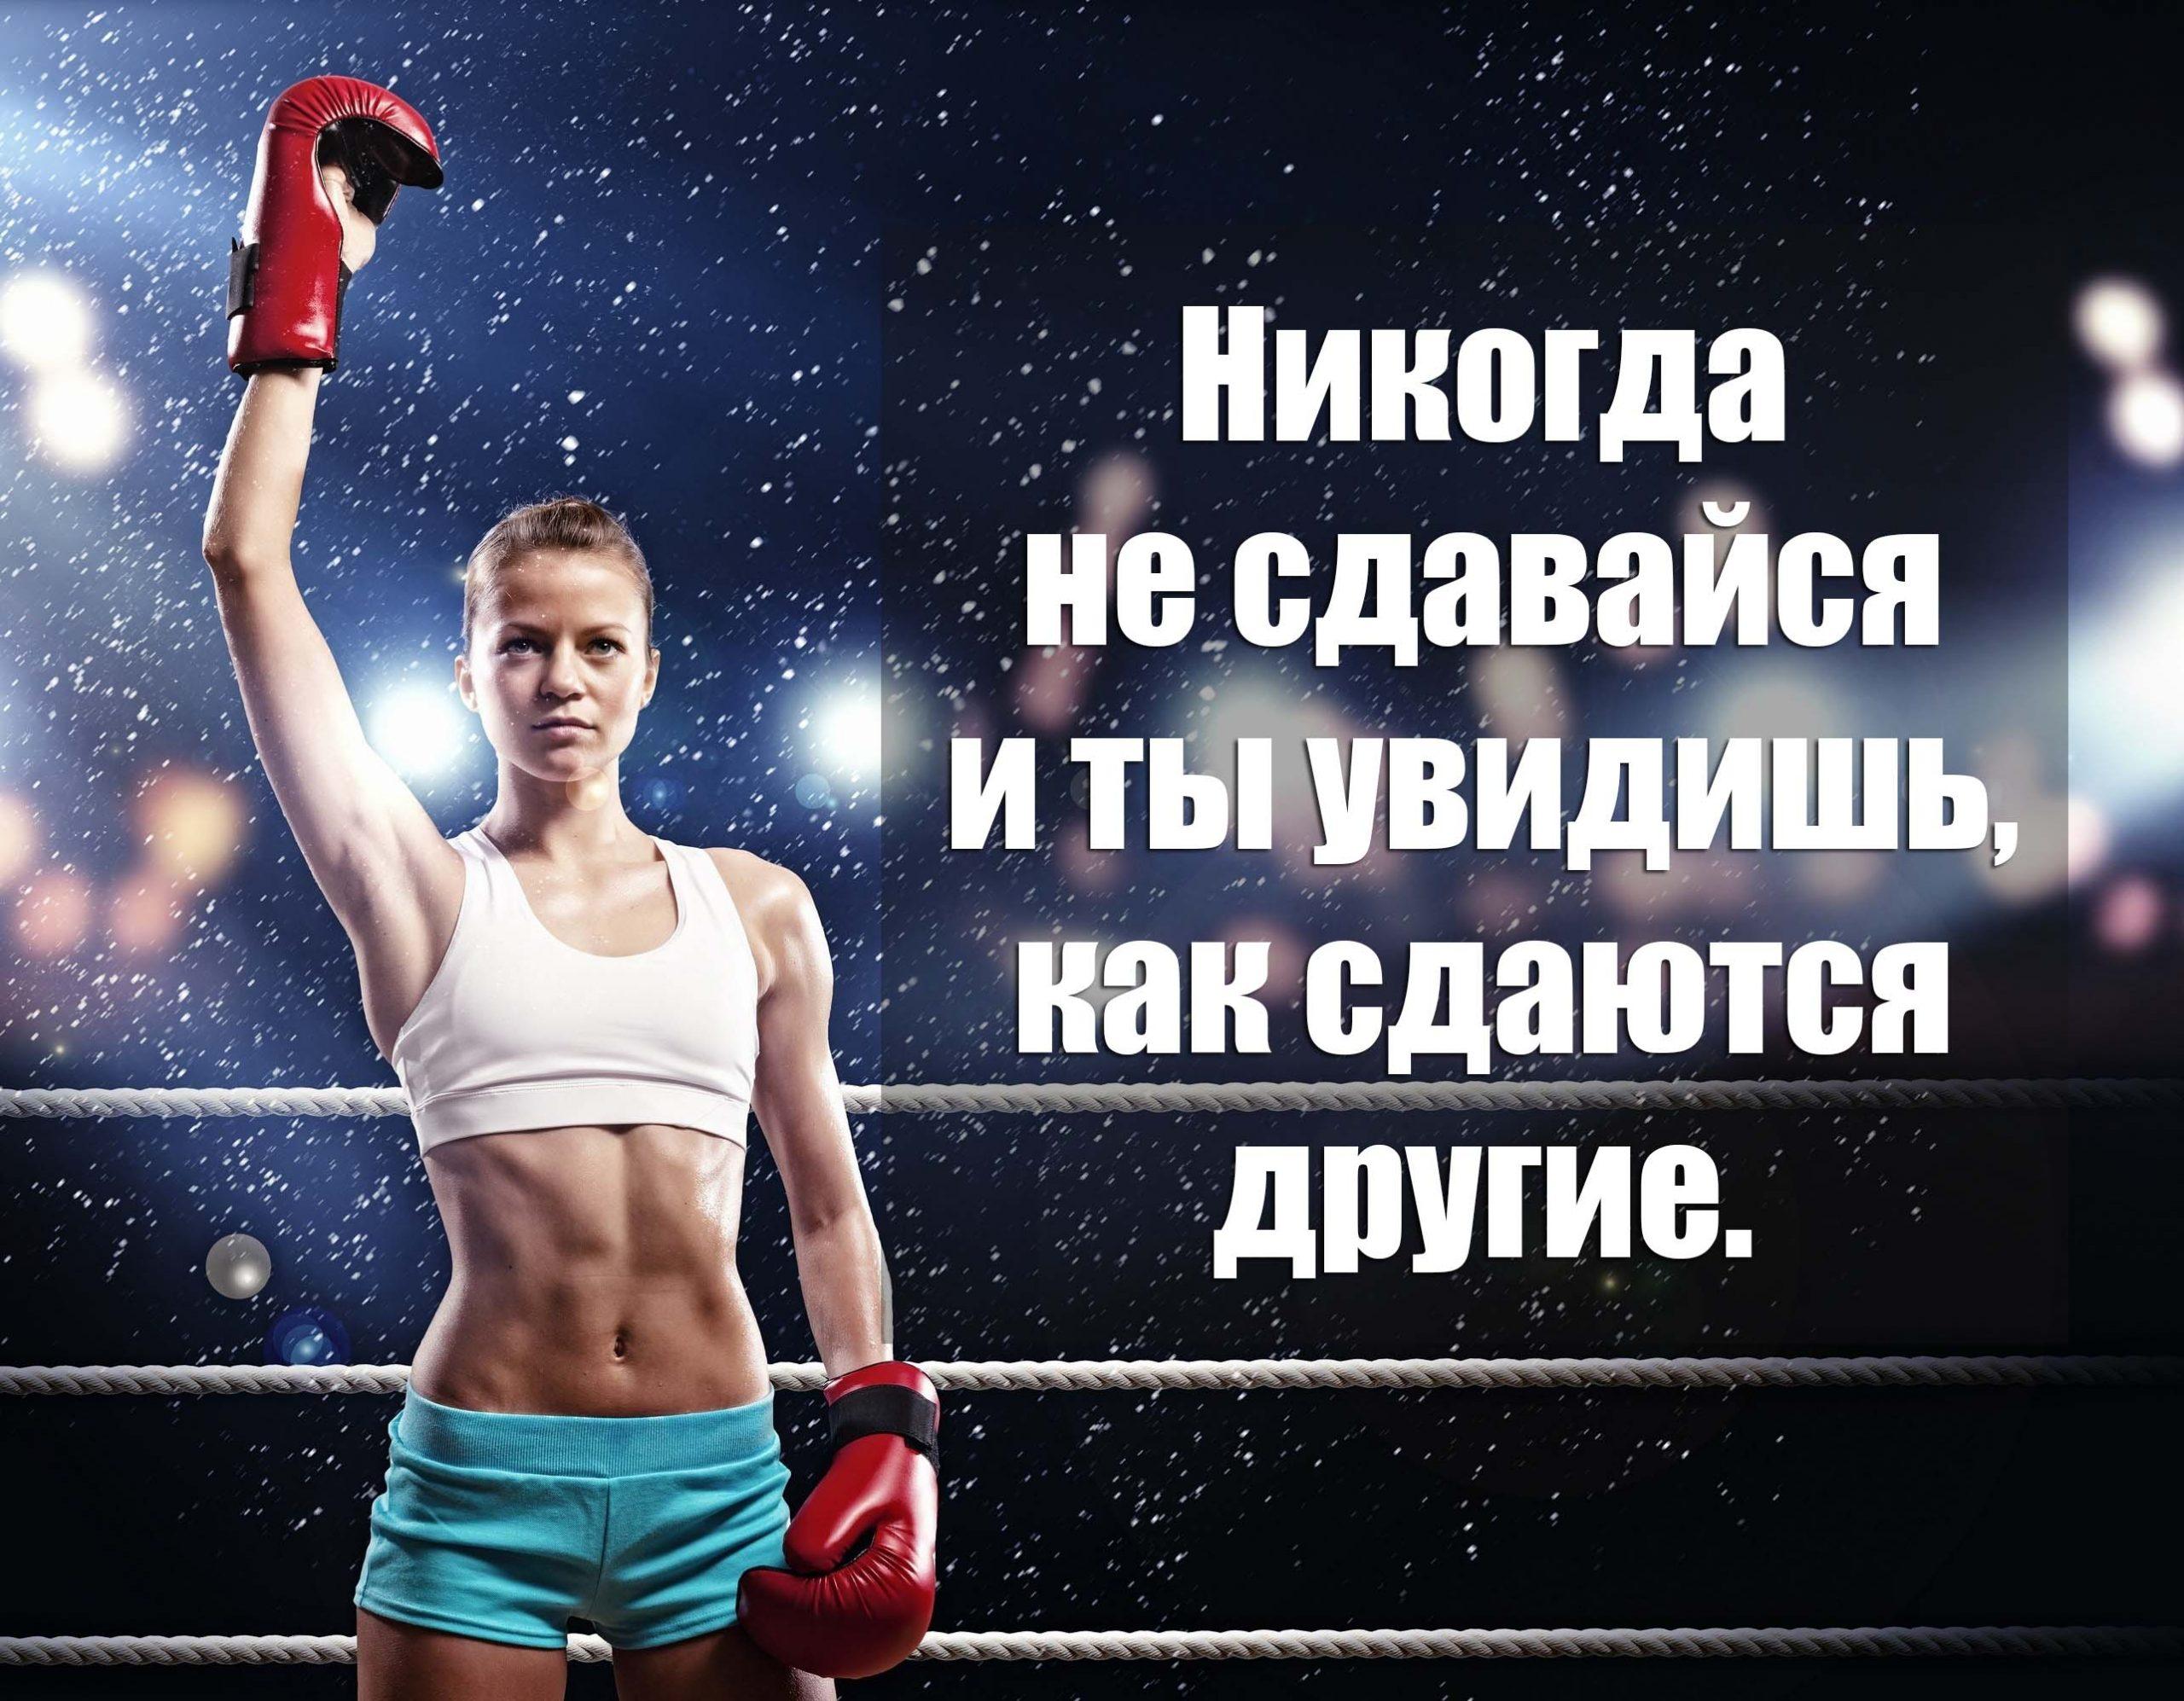 спорт жизнь картинки цитаты